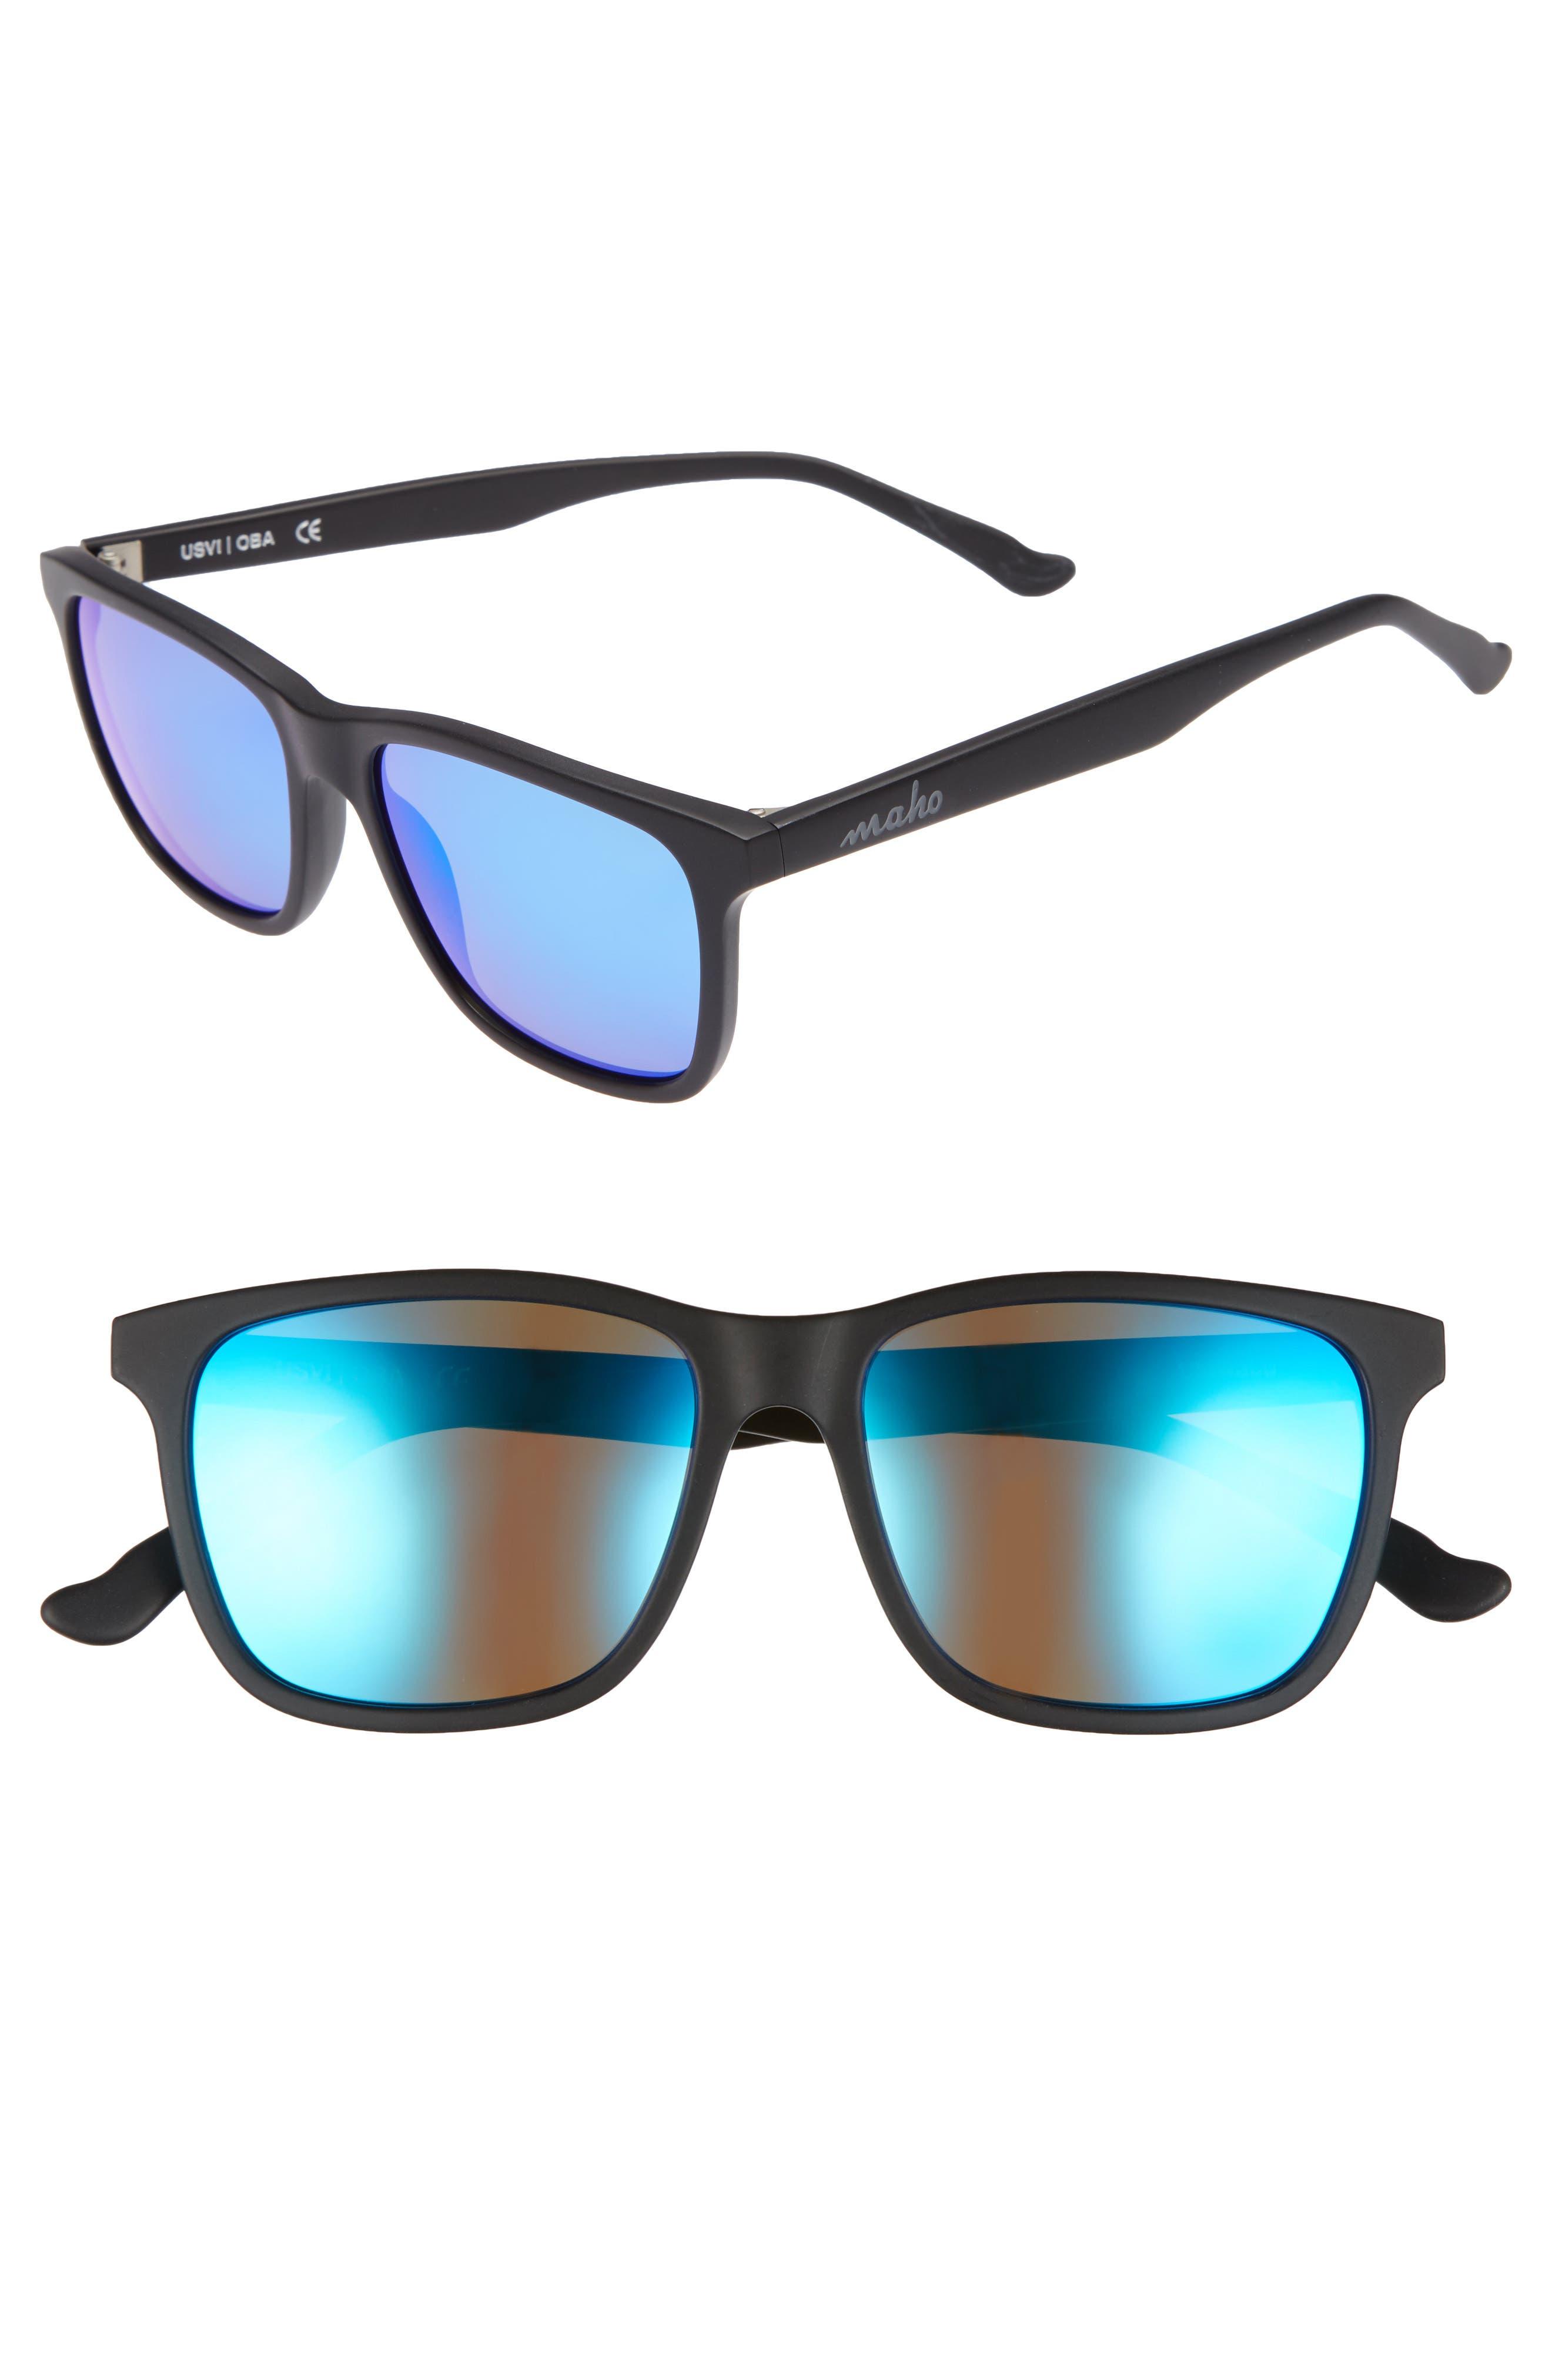 Uluwatu 52mm Polarized Sunglasses,                             Main thumbnail 1, color,                             020